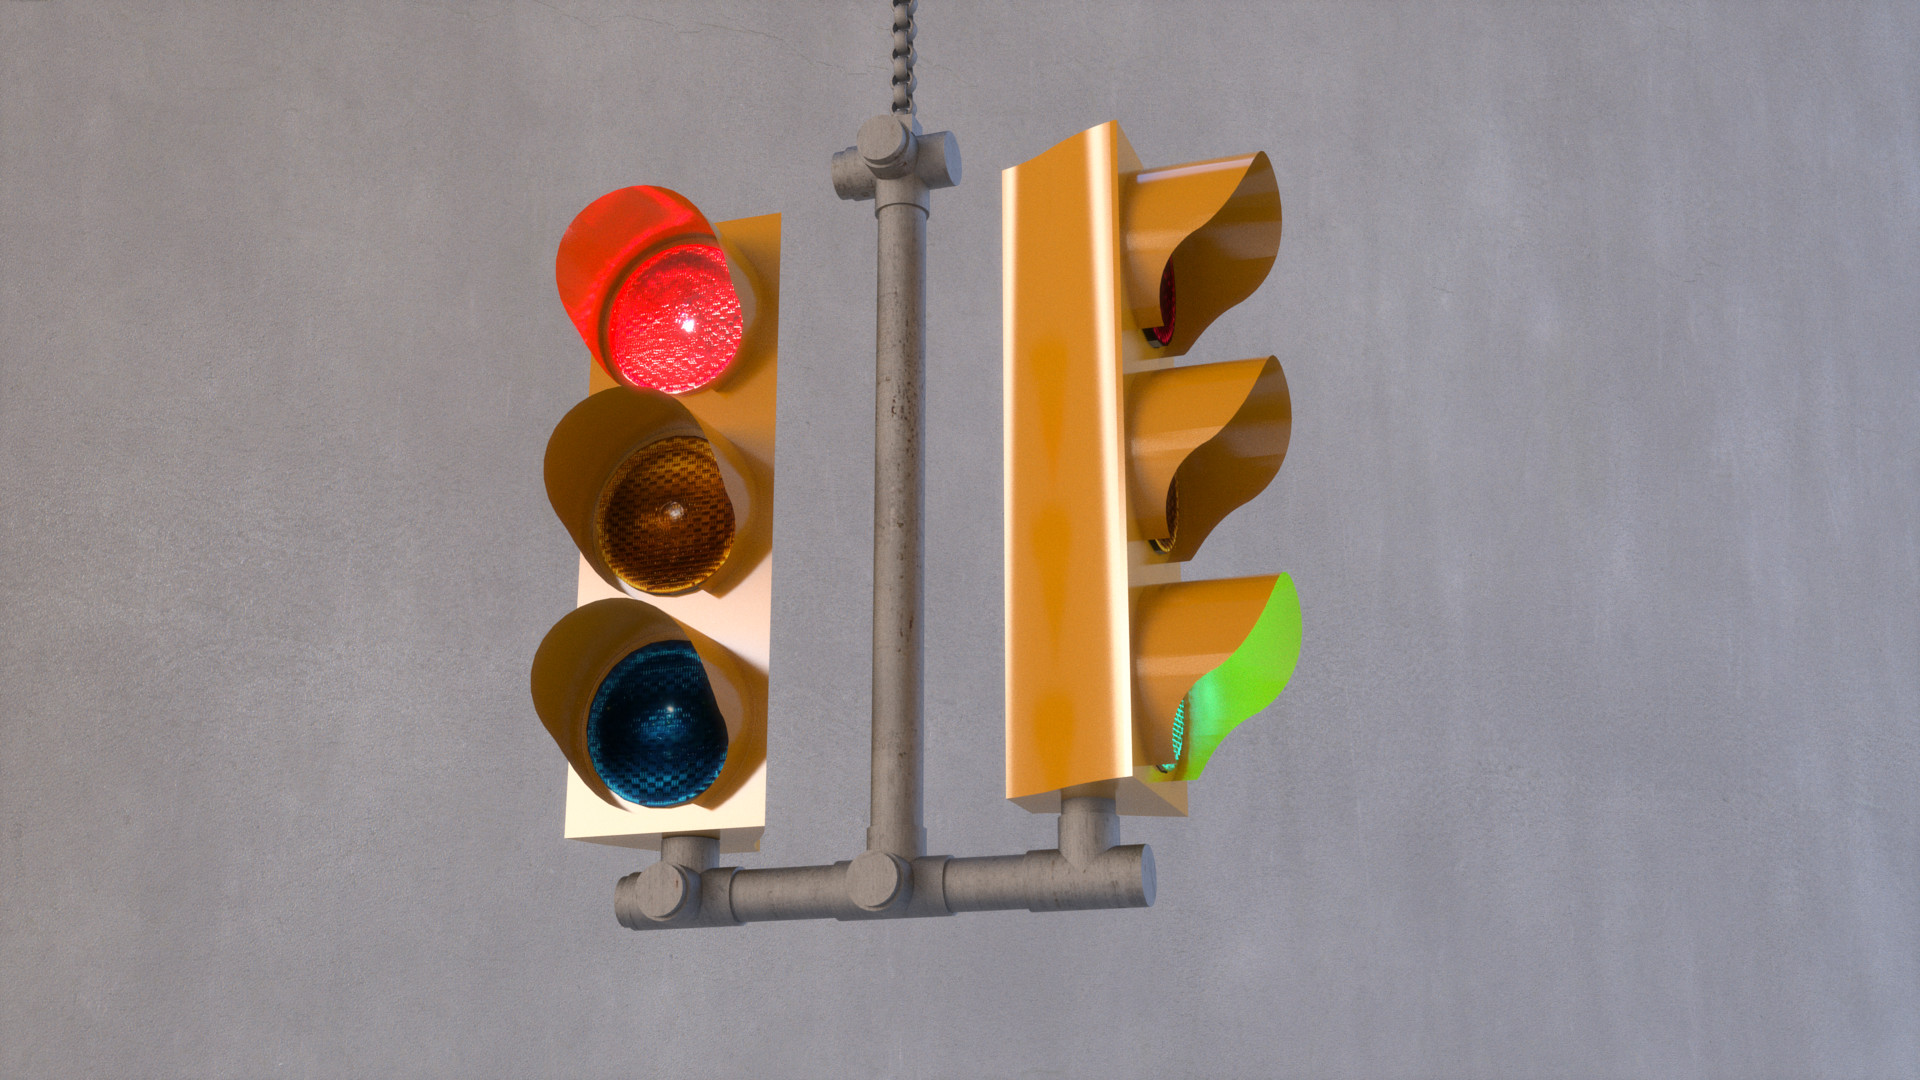 Duane kemp proposed kitchen signal light 03